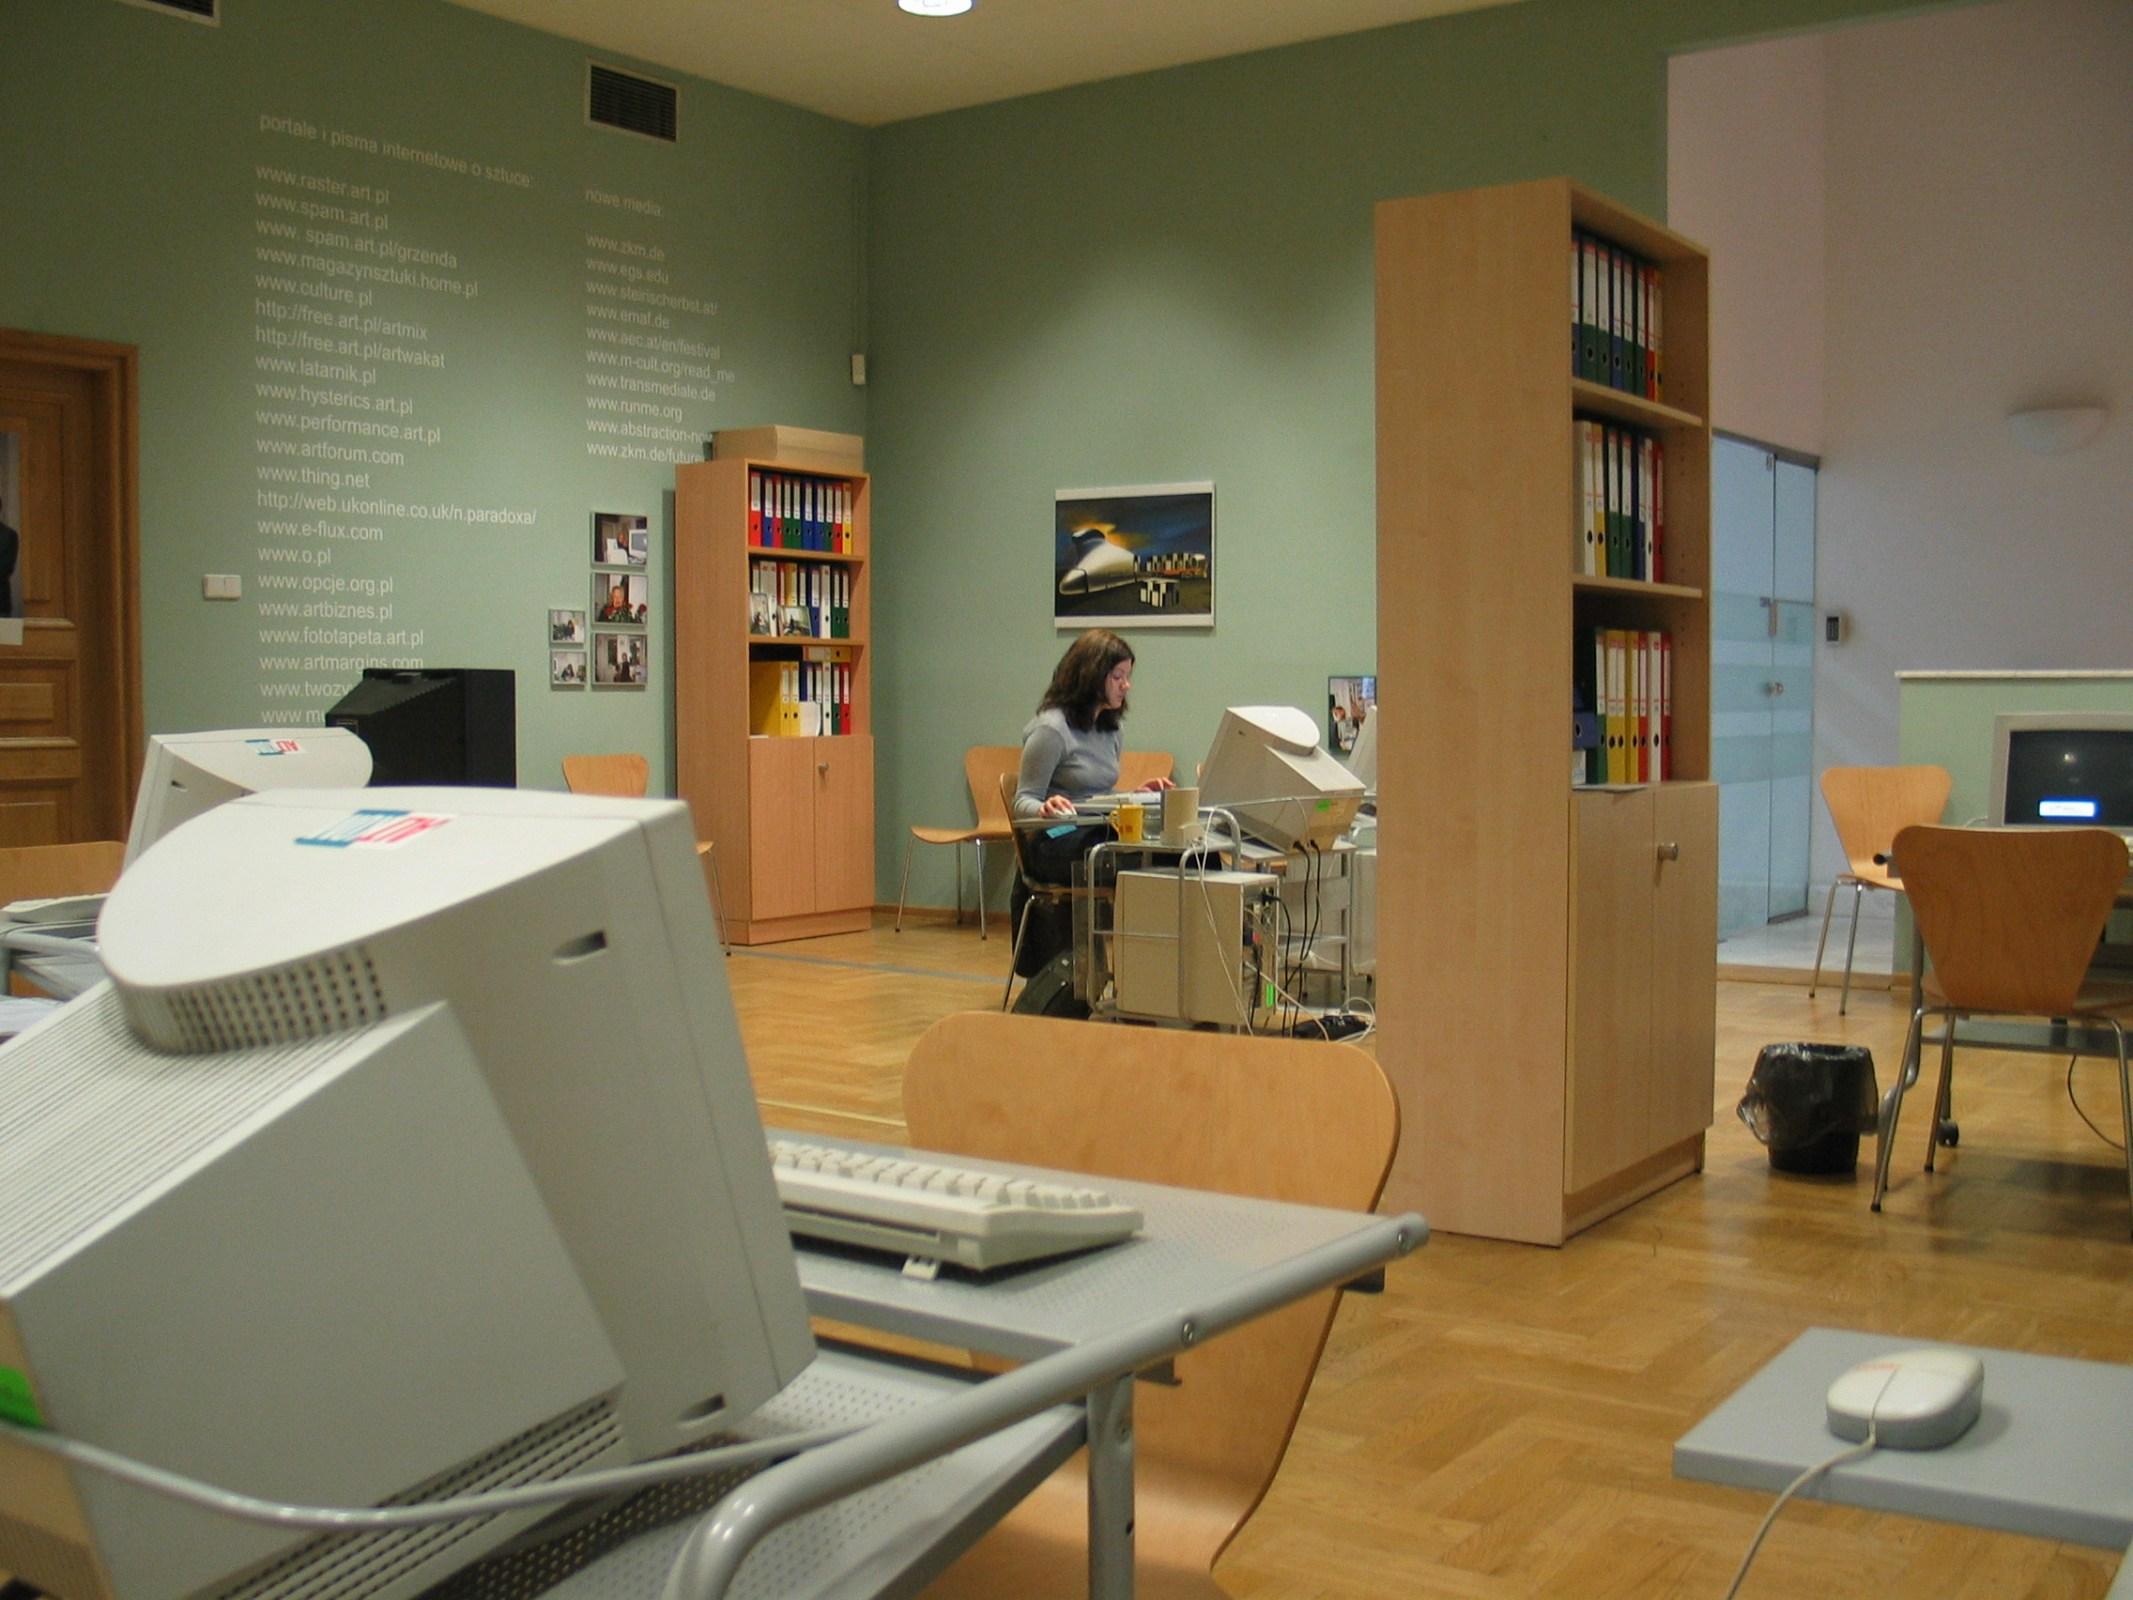 Karol Radziszewski, Office, 2005, courtesy of the artist